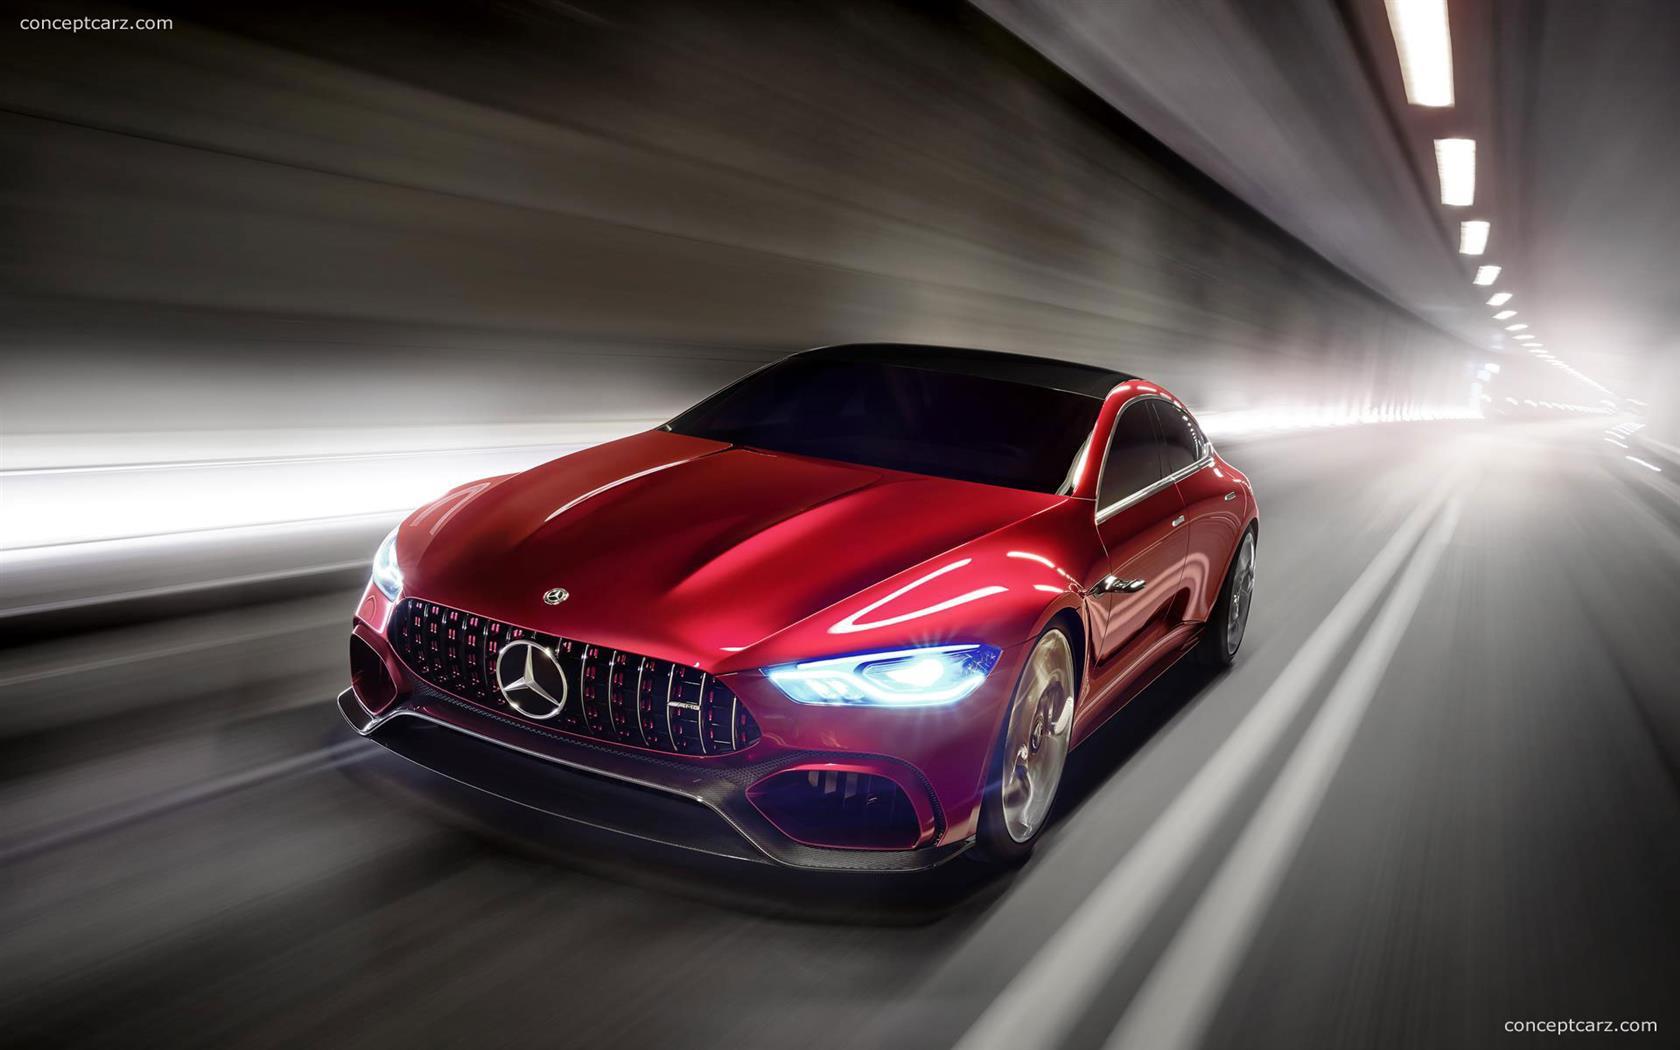 2017 Mercedes-Benz AMG GT Concept